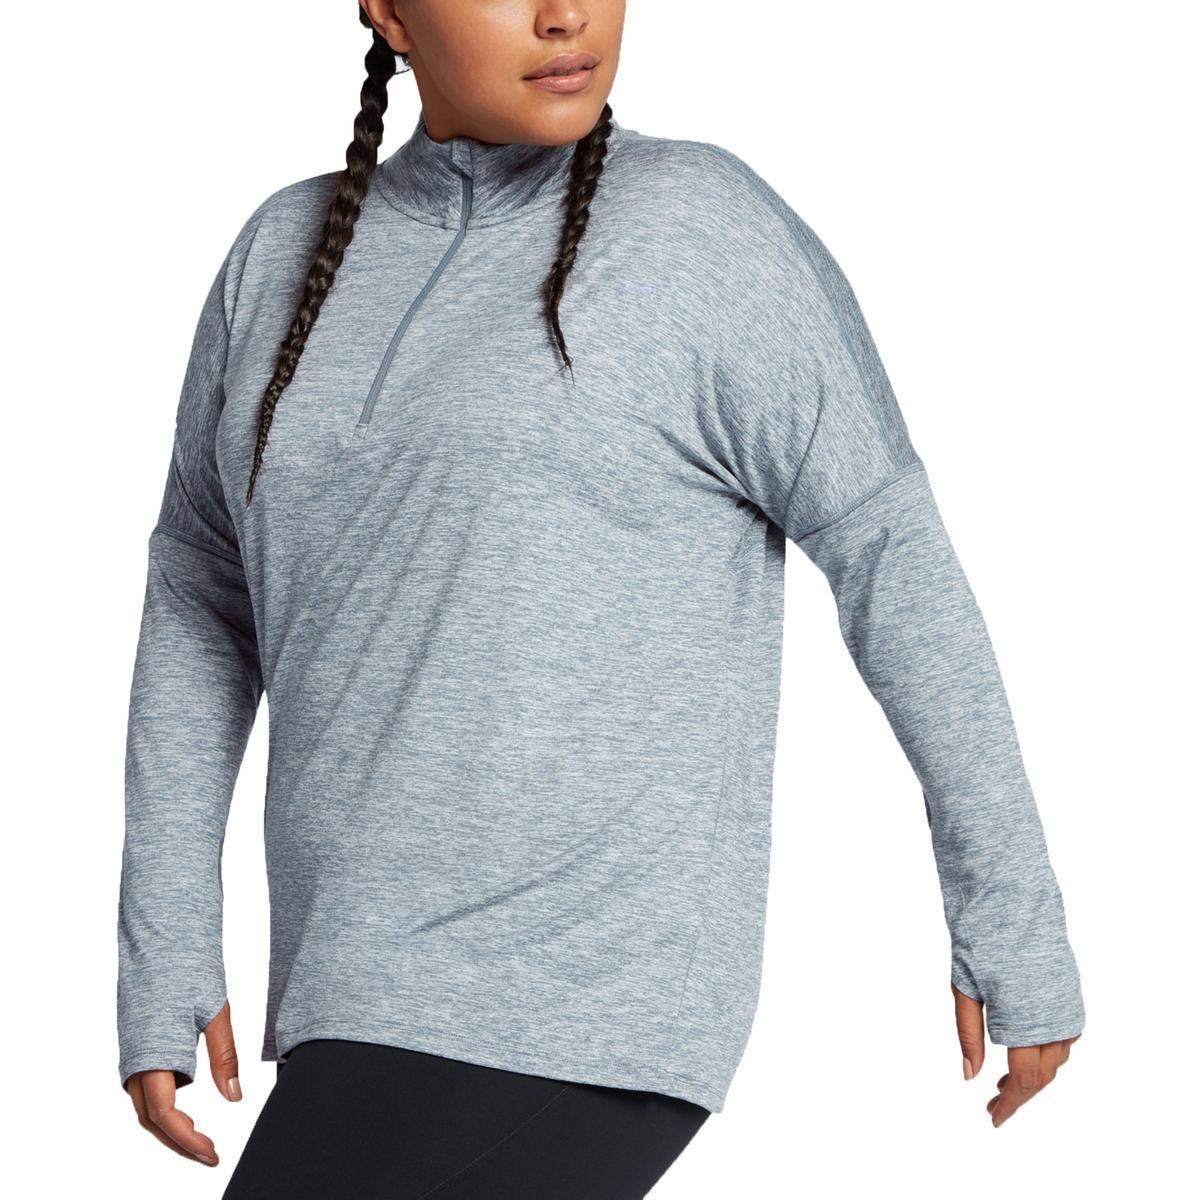 Nike Women's Element Long Sleeve 1/2 Zip Running Top (2X) 854328 311